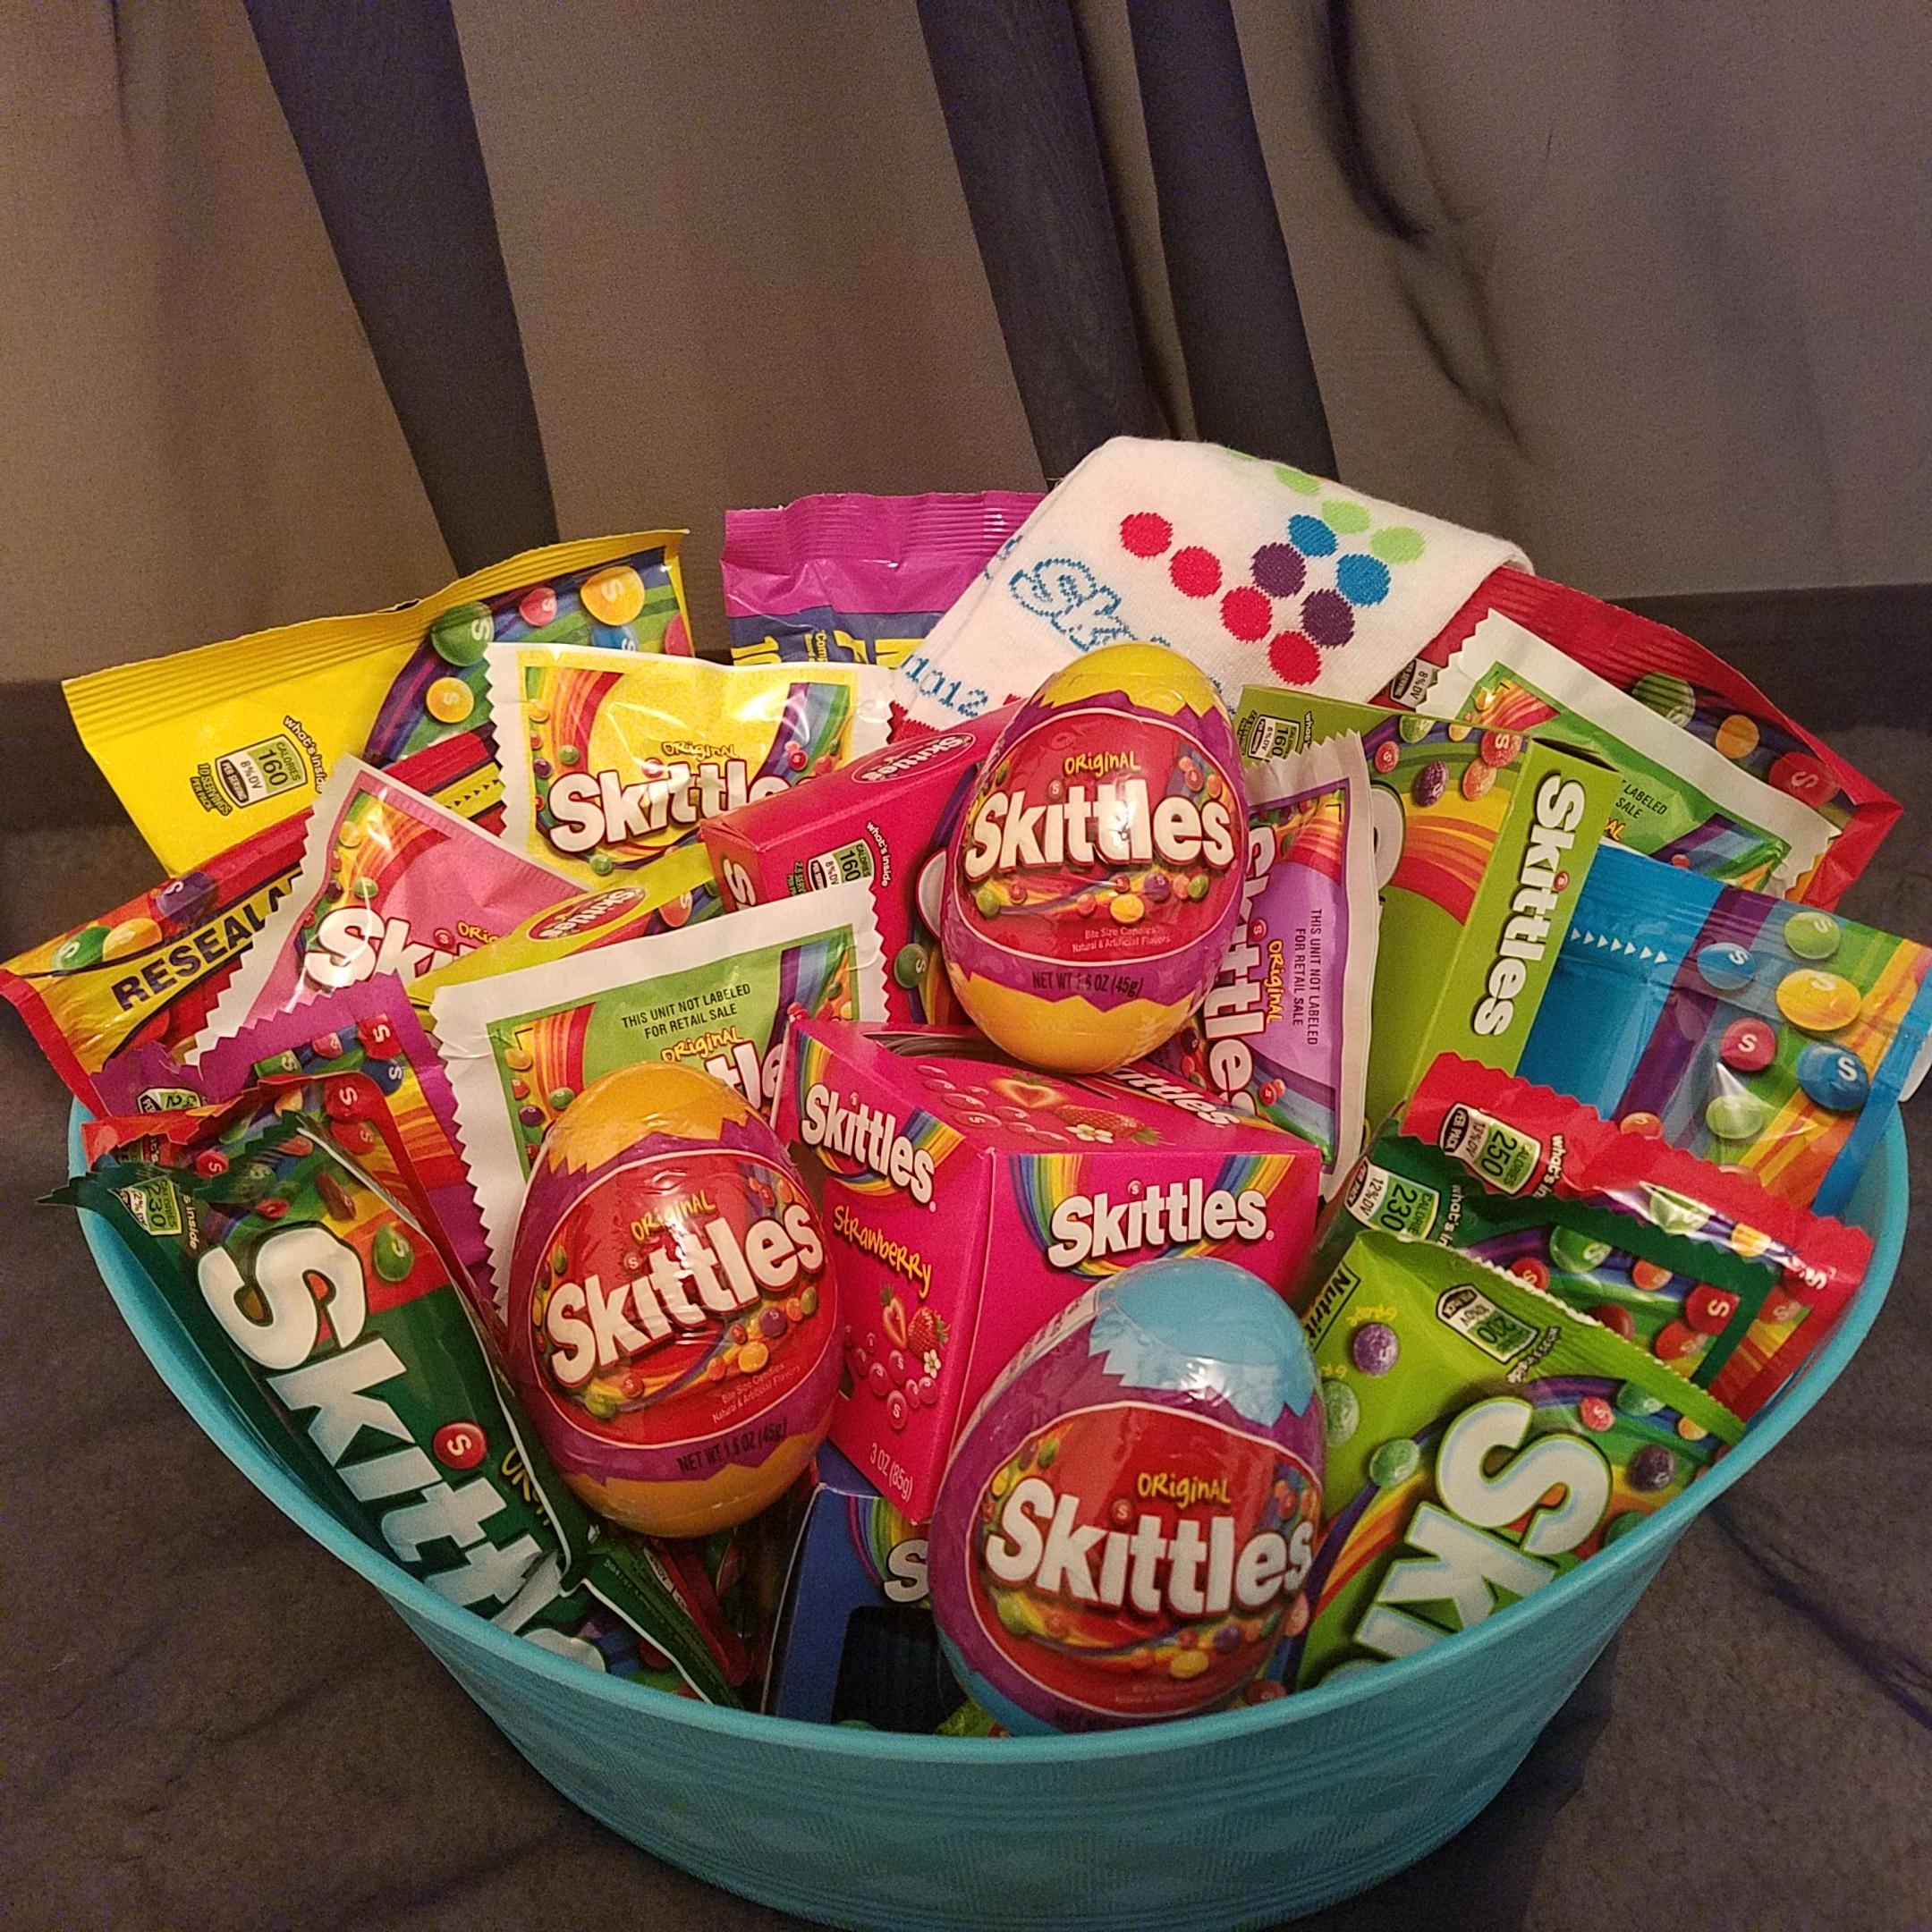 Skittles candy gift basket